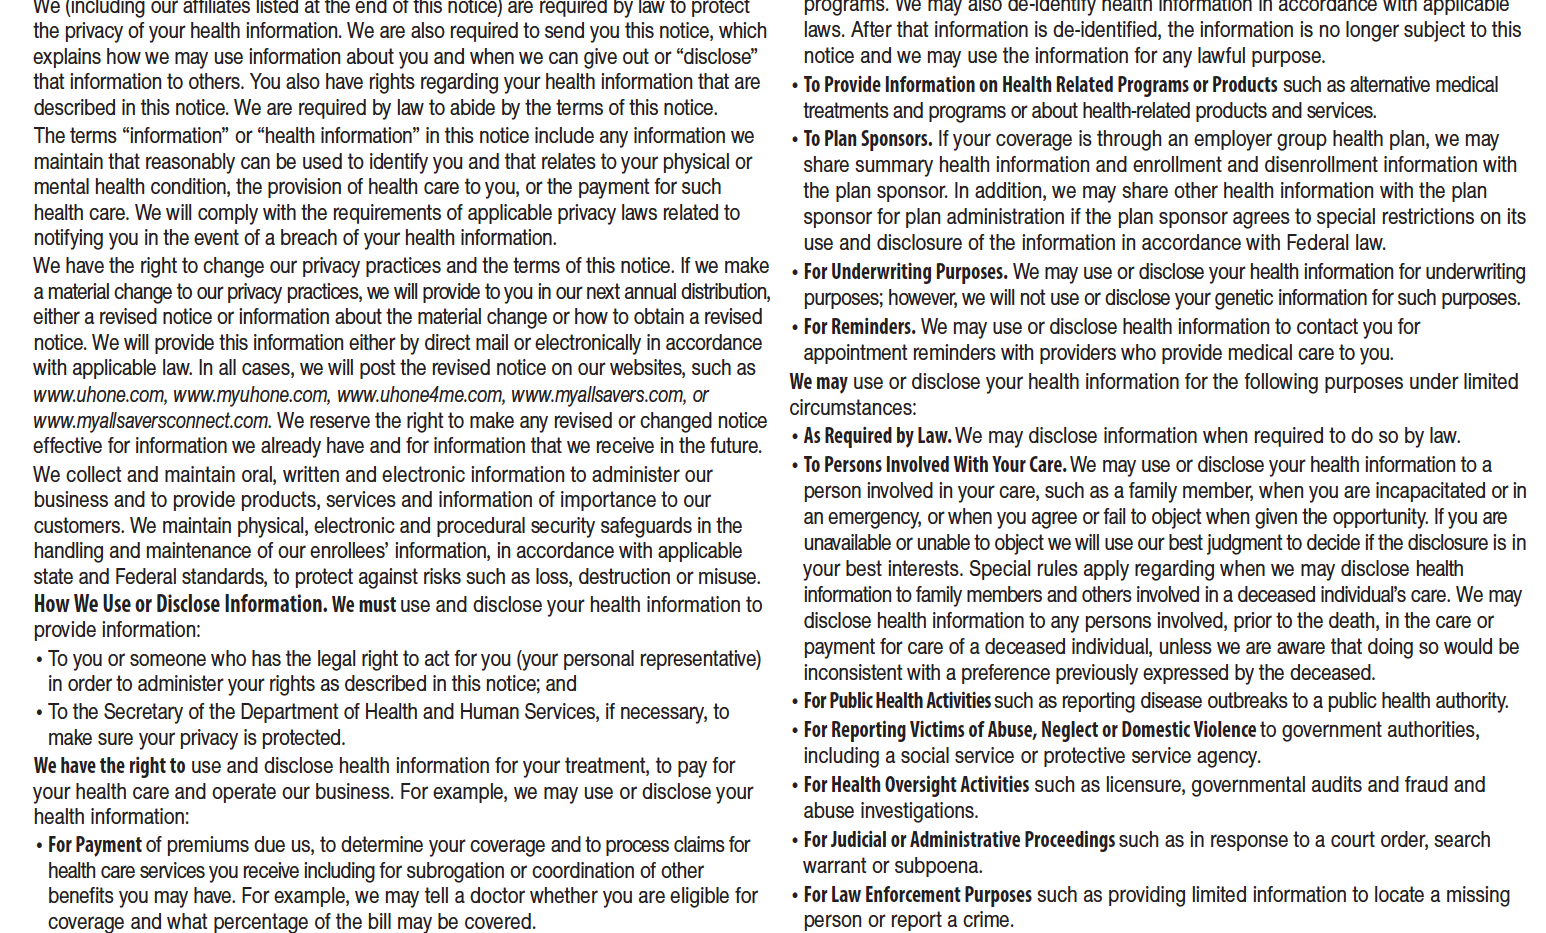 UHC Short Term Medical - Pg 16.png